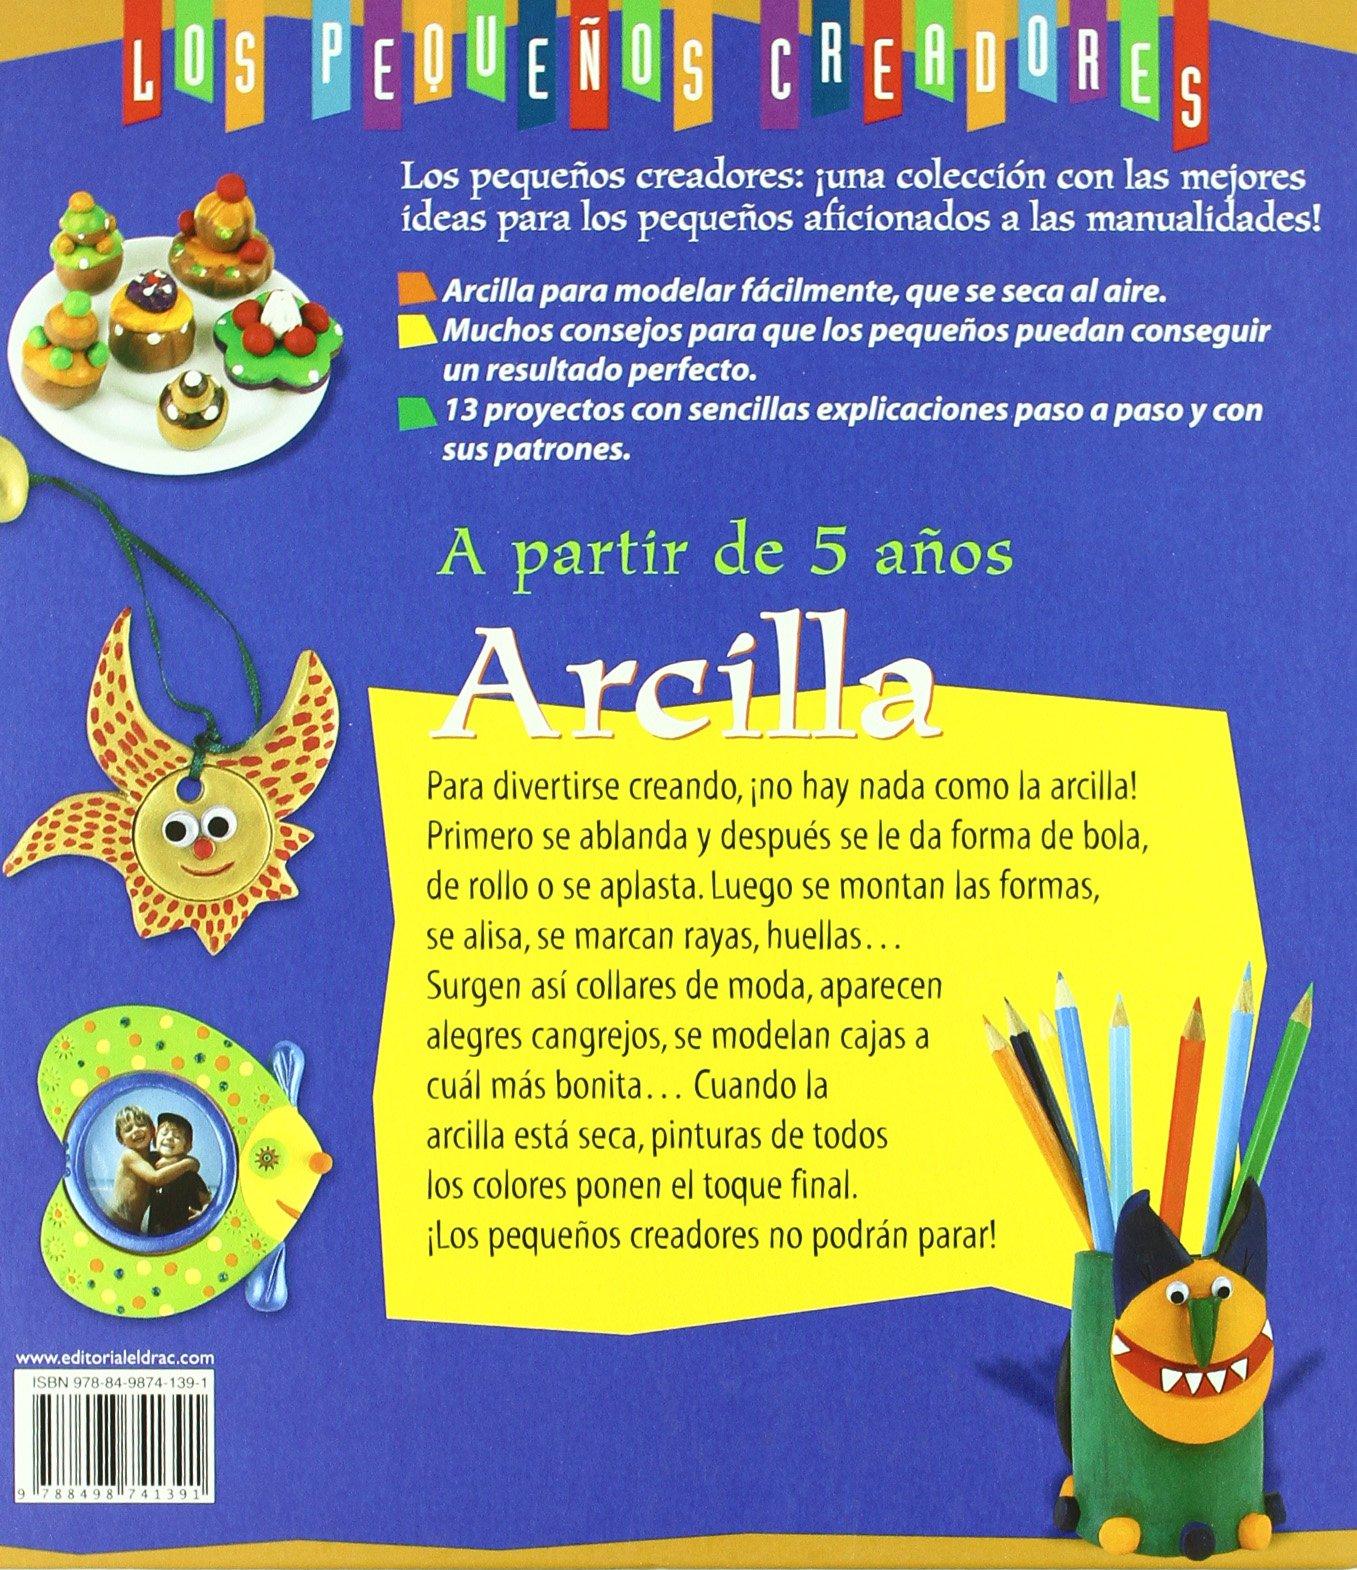 Arcilla / Clay (Los pequenos creadores / The Little Artists) (Spanish Edition): Patricia Vibien: 9788498741391: Amazon.com: Books